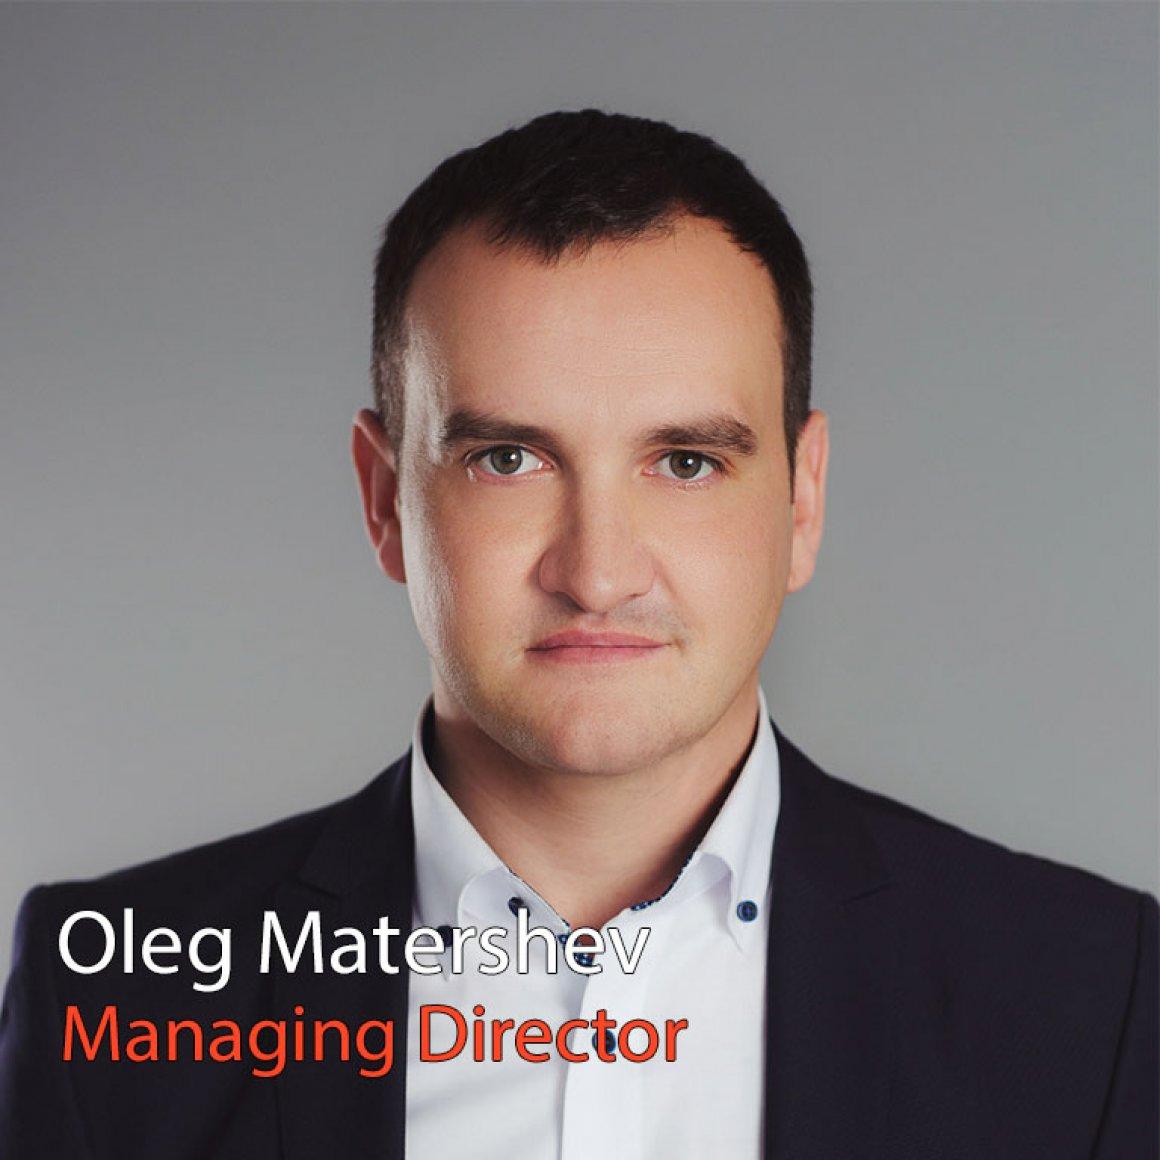 Oleg sw